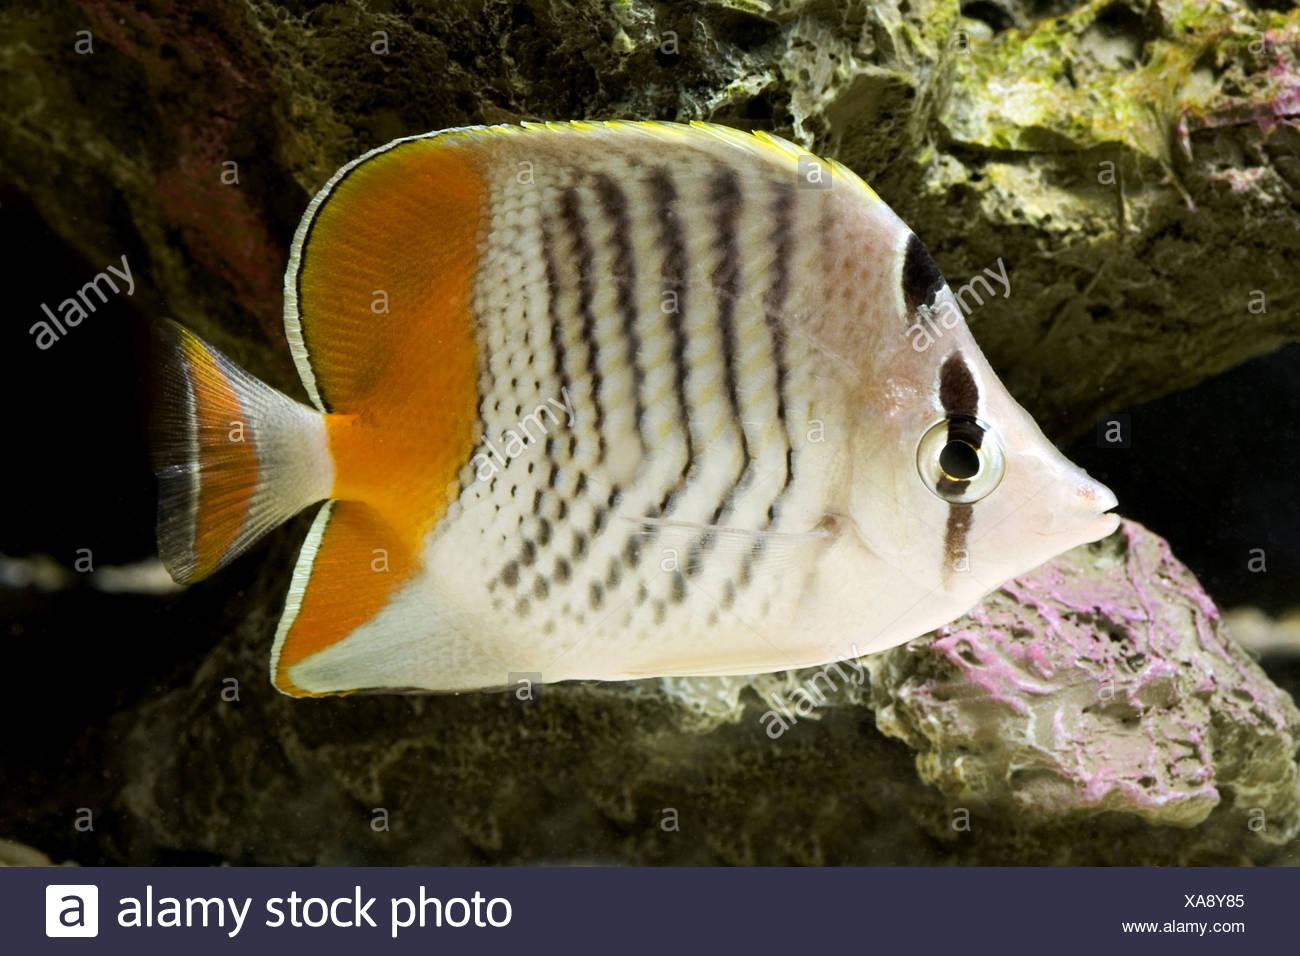 seychelles butterflyfish, chaetodon madagaskariensis - Stock Image